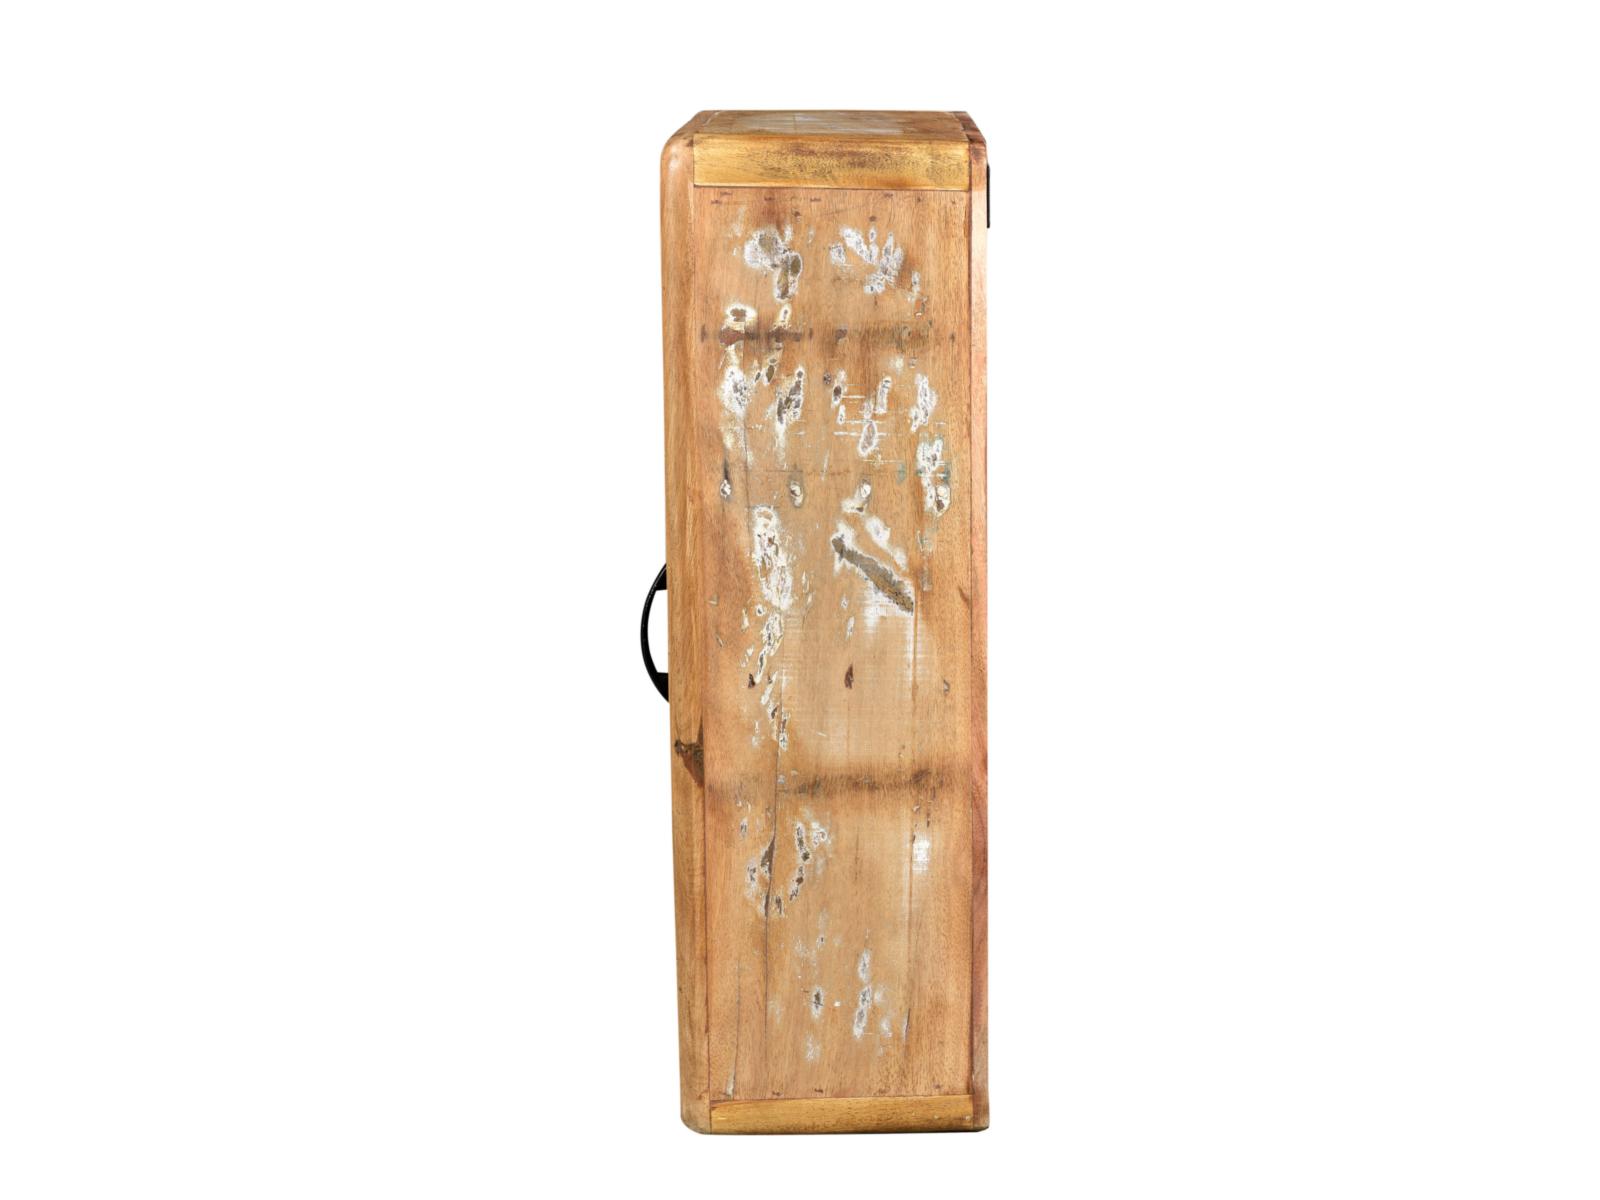 Bad Hngeschrank Kalkutta Badschrank Wandschrank recyceltes Holz bunt Badmbel  eBay